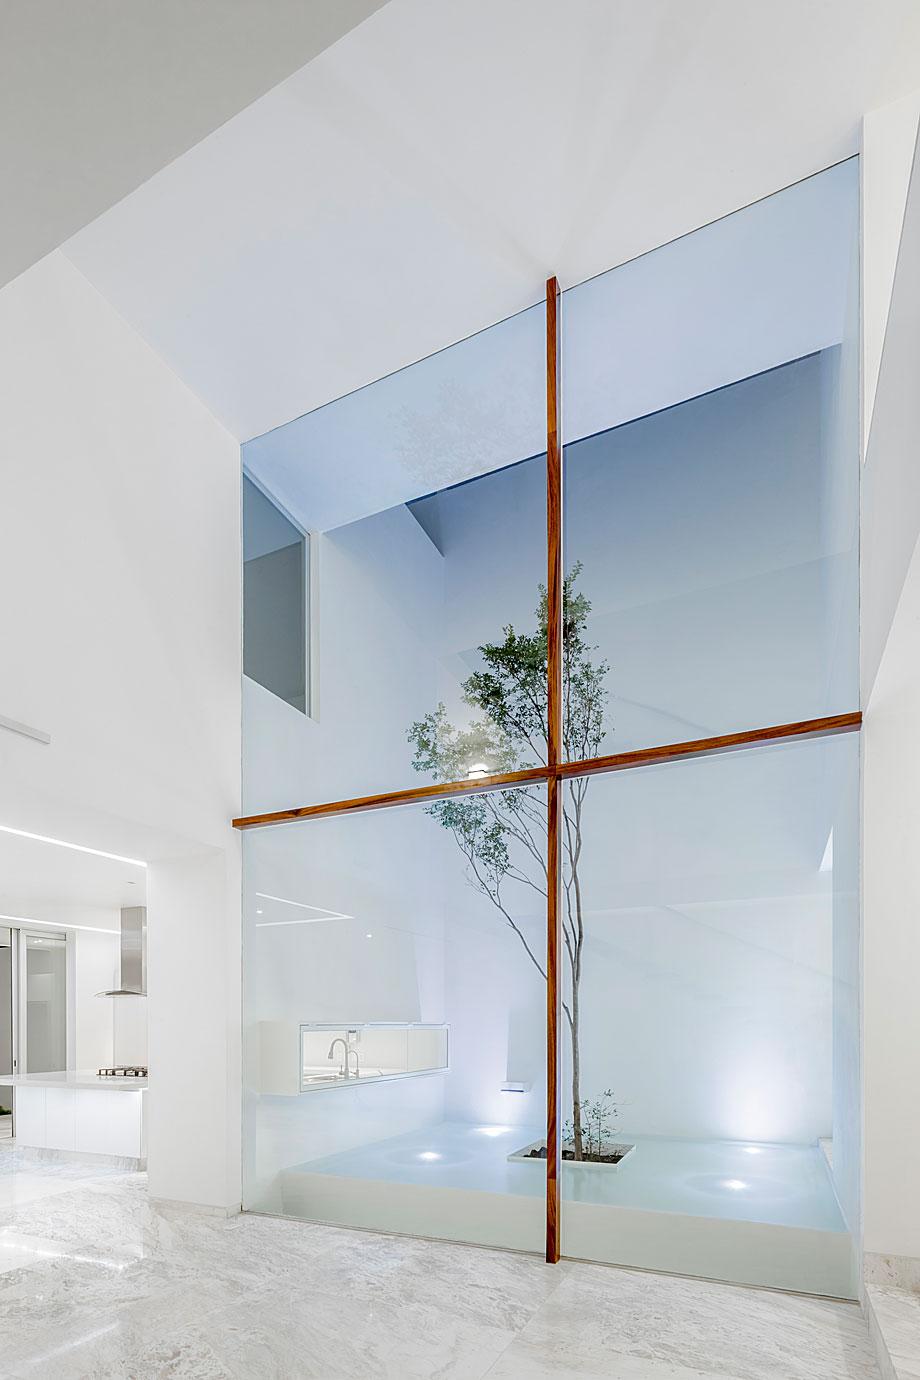 Casa En Guadalajara Por Abraham Cota Paredes # Muebles Rohan Guadalajara